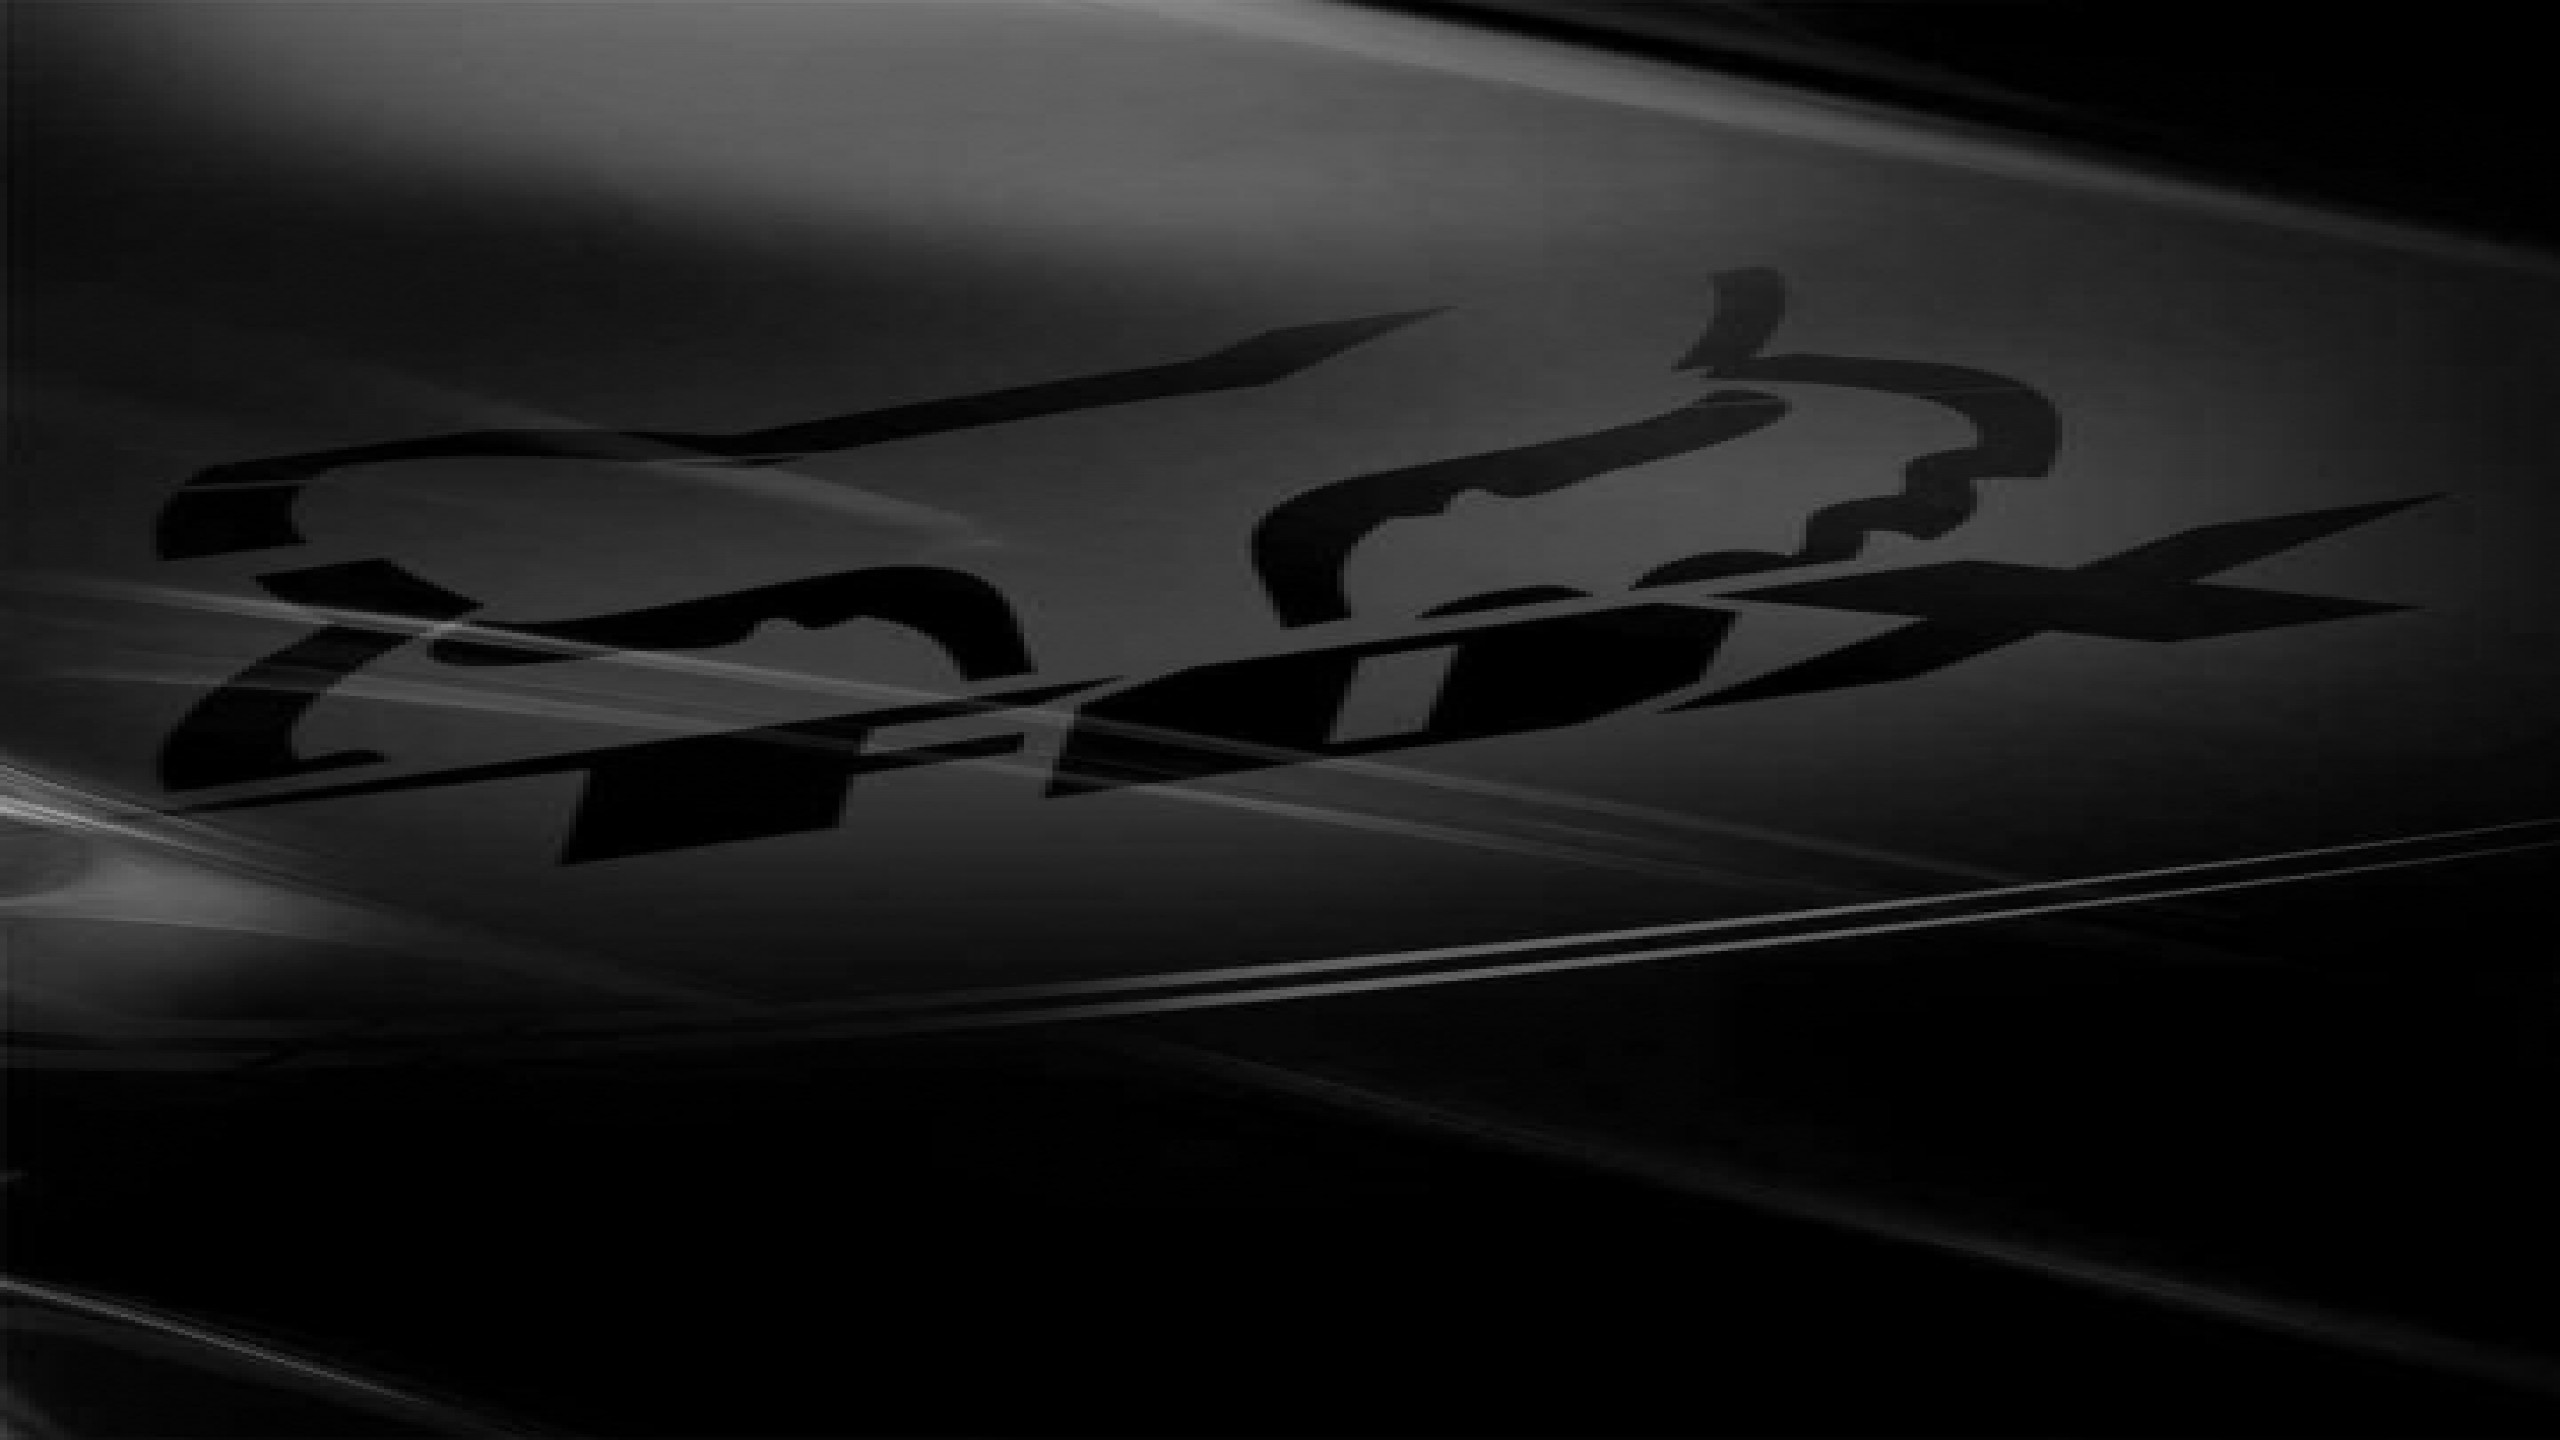 Best ideas about Fox Racing Logo on Pinterest Fox racing 1440×1080 Free Fox  Racing